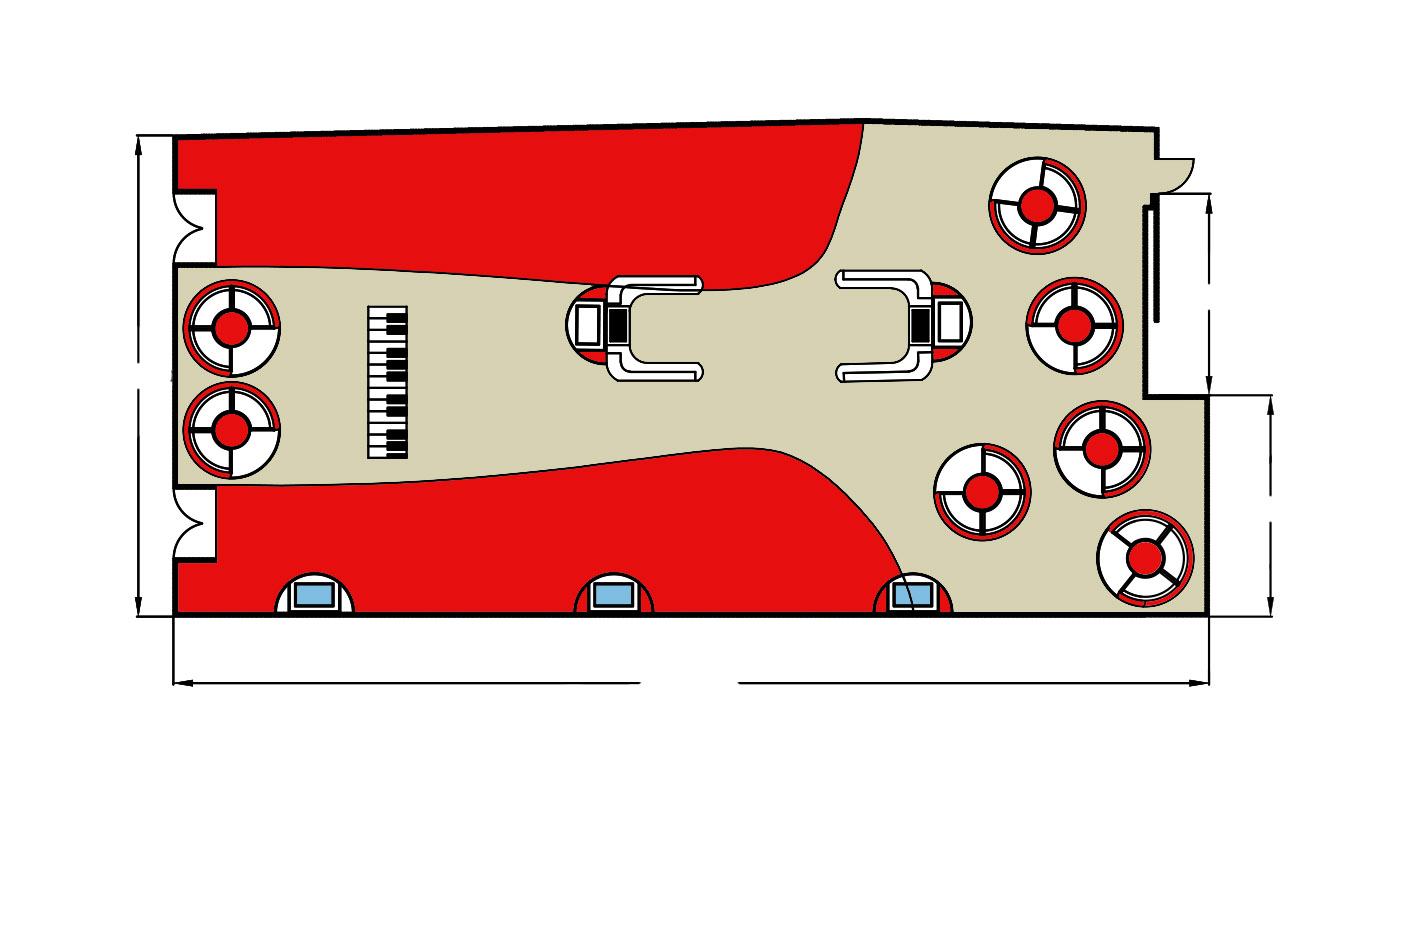 Clinton coloured floorplan top view